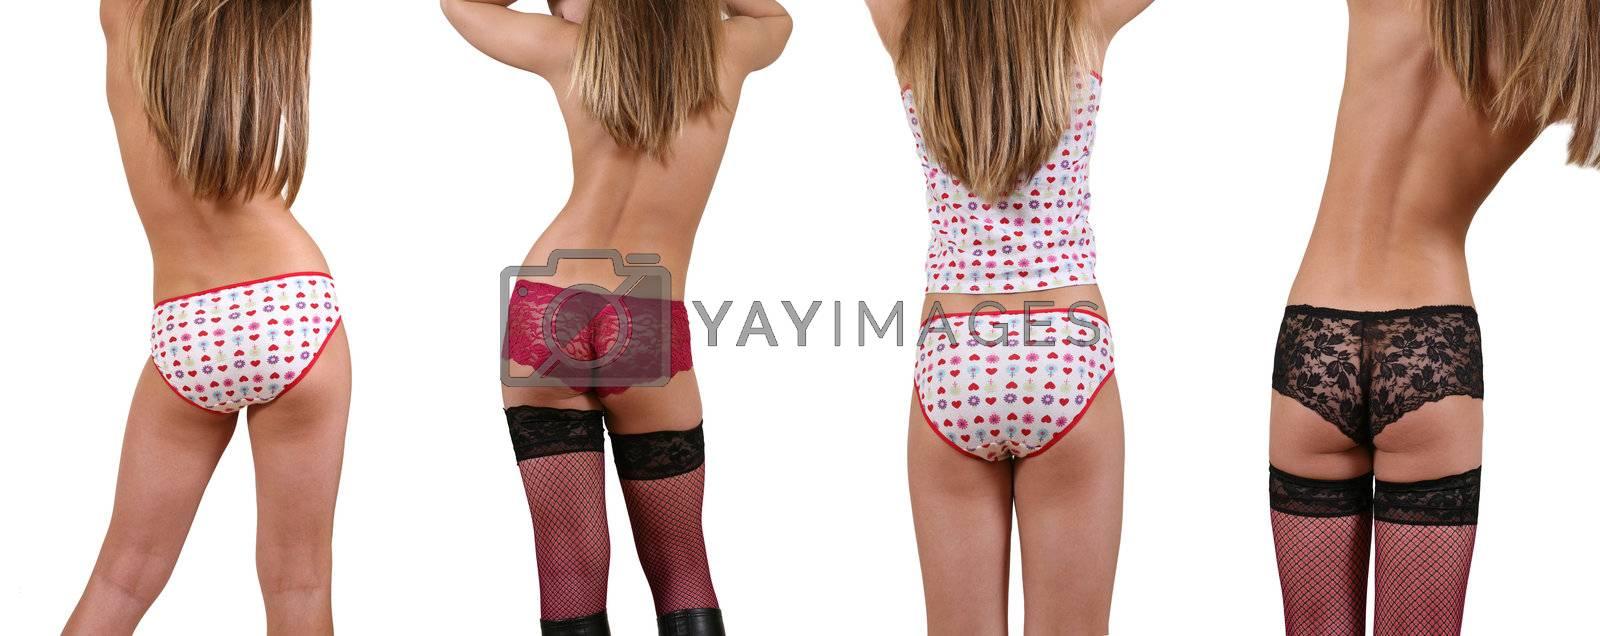 Underwear  by friday